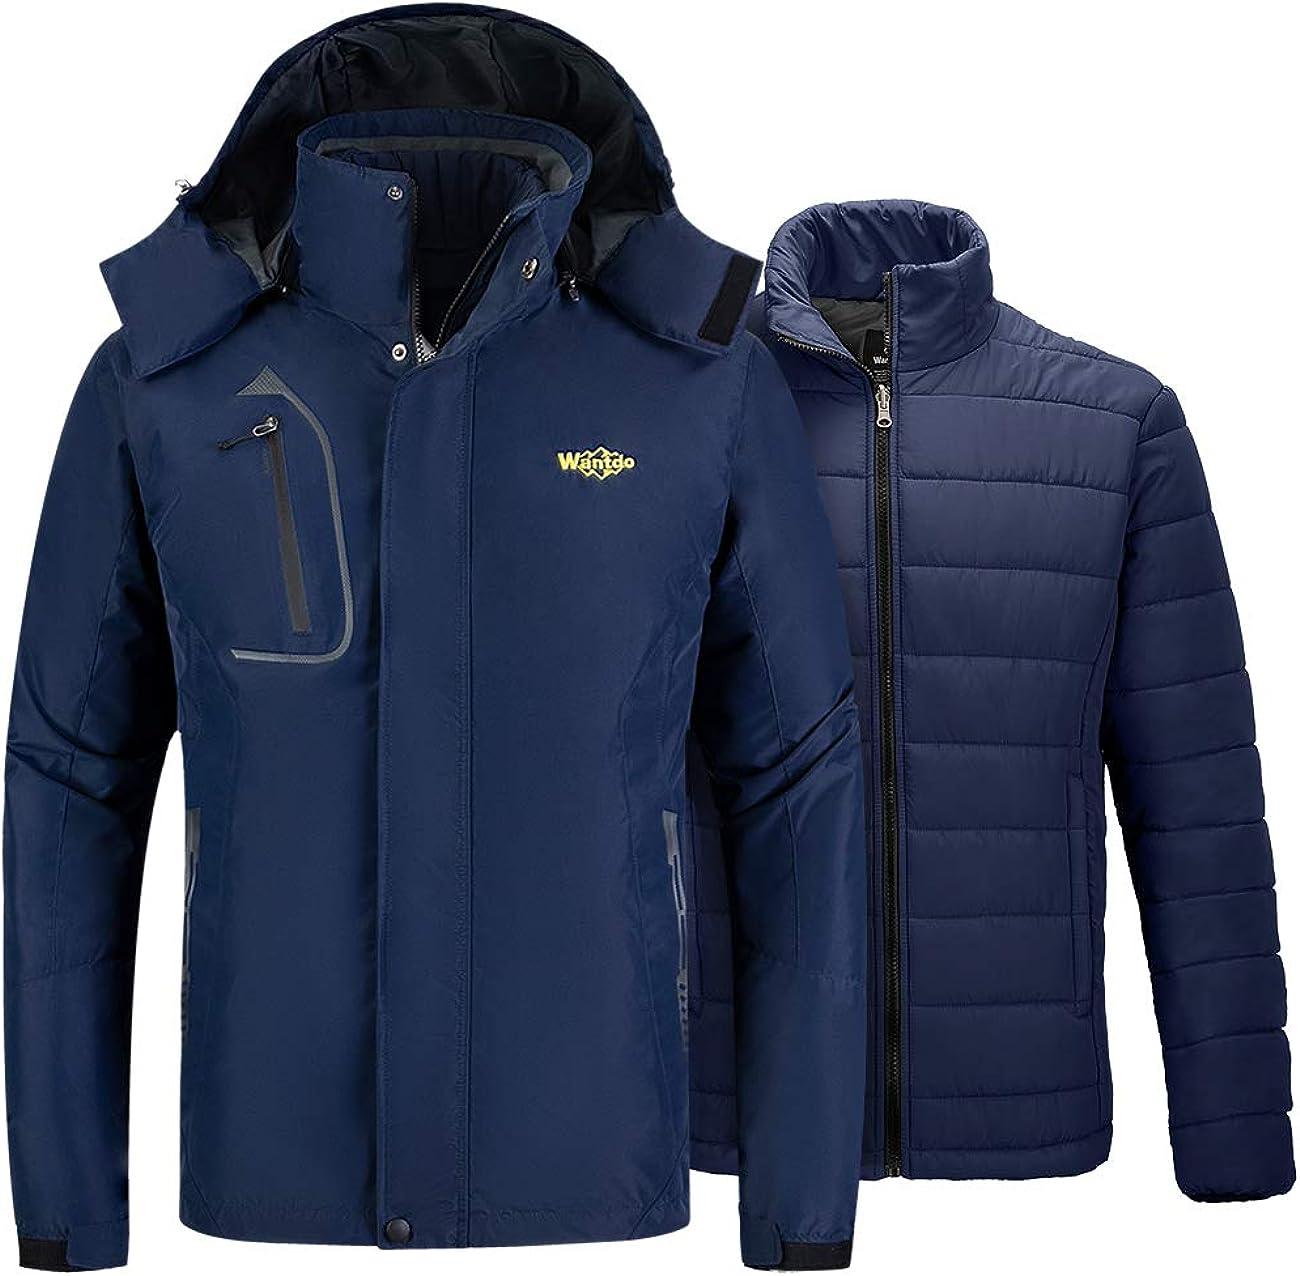 Wantdo Men's 3 in 1 Puffer Liner Ski Jacket Waterproof Rain Snow Warm Winter Coat